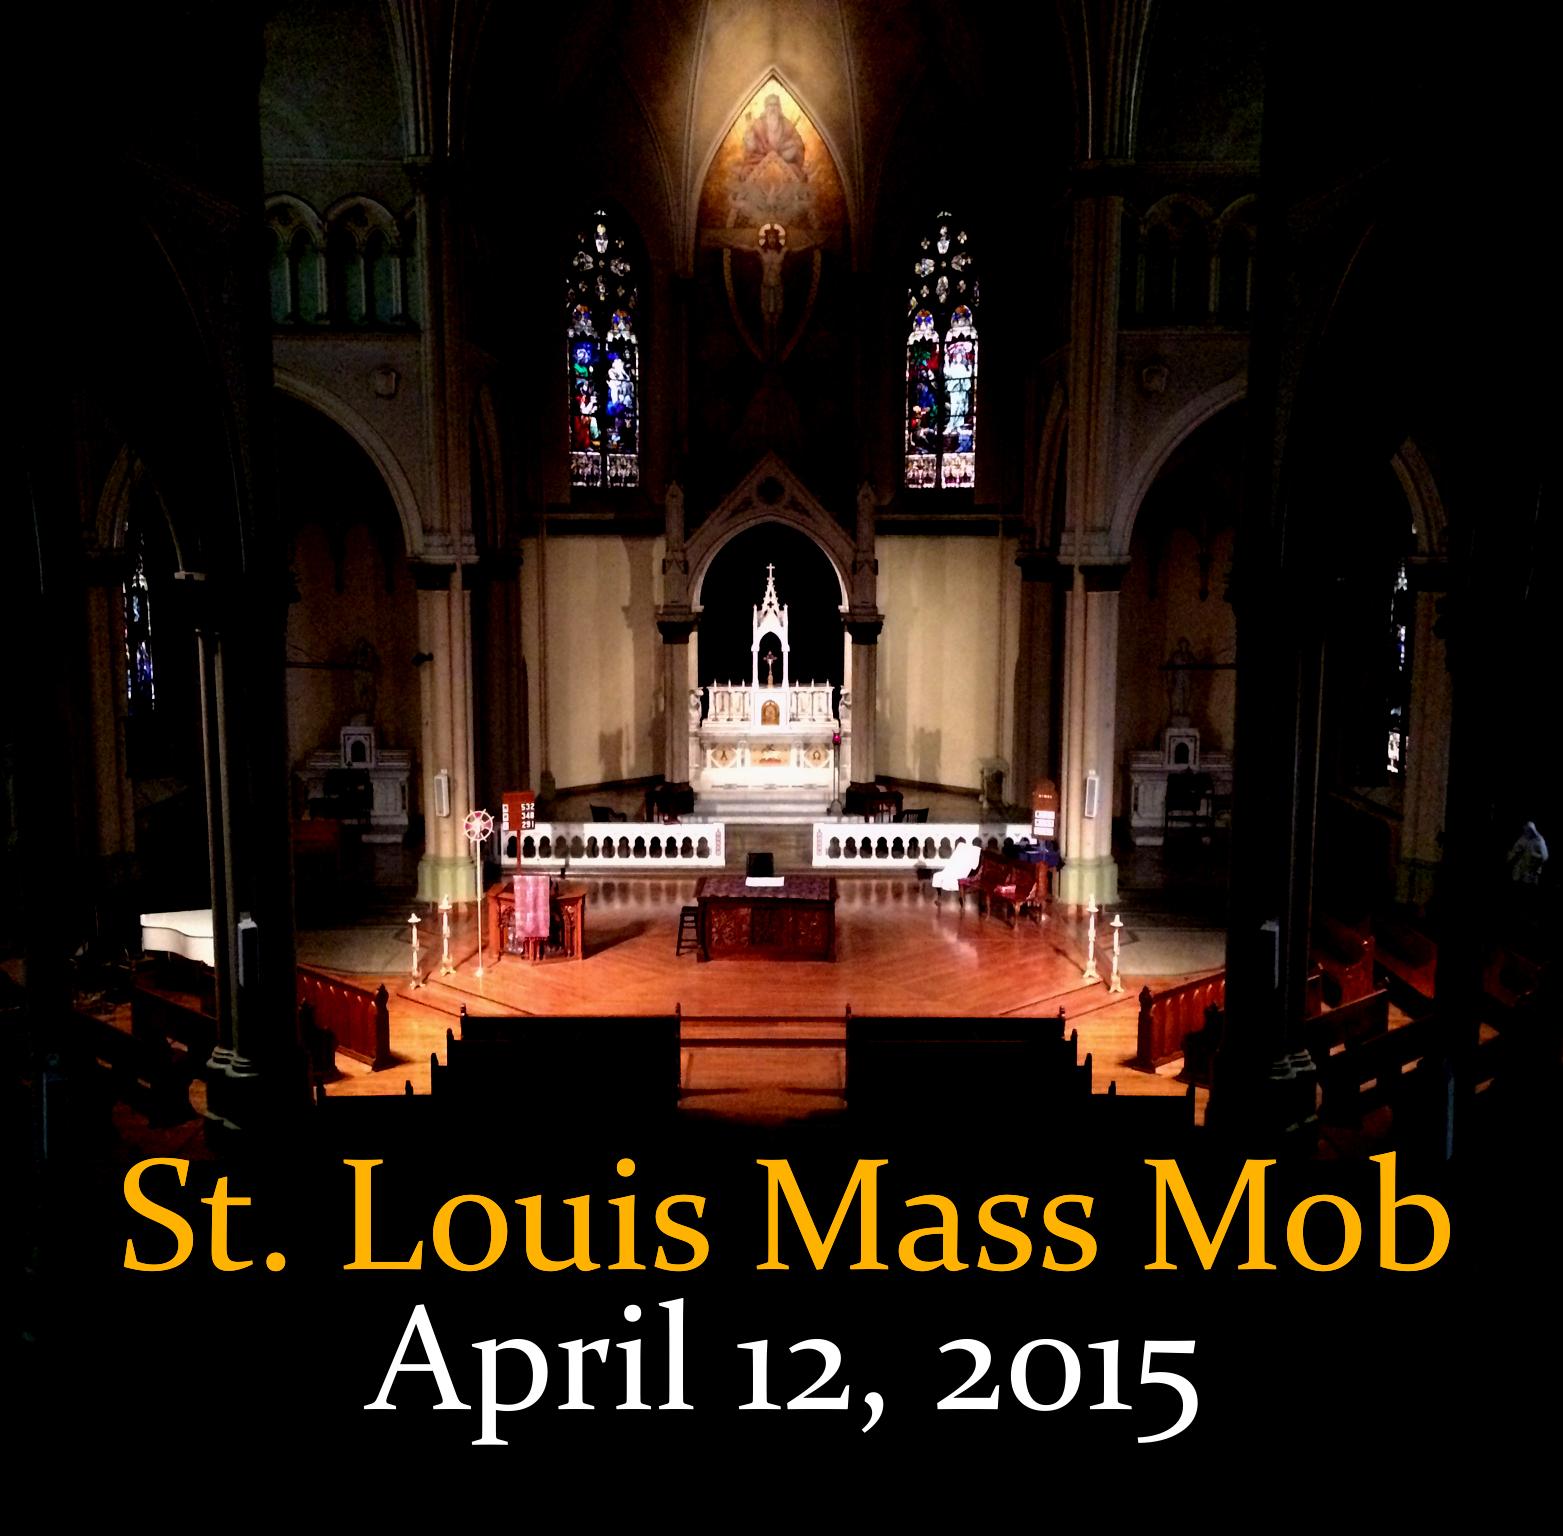 Mass Mob Backlit altar.jpg